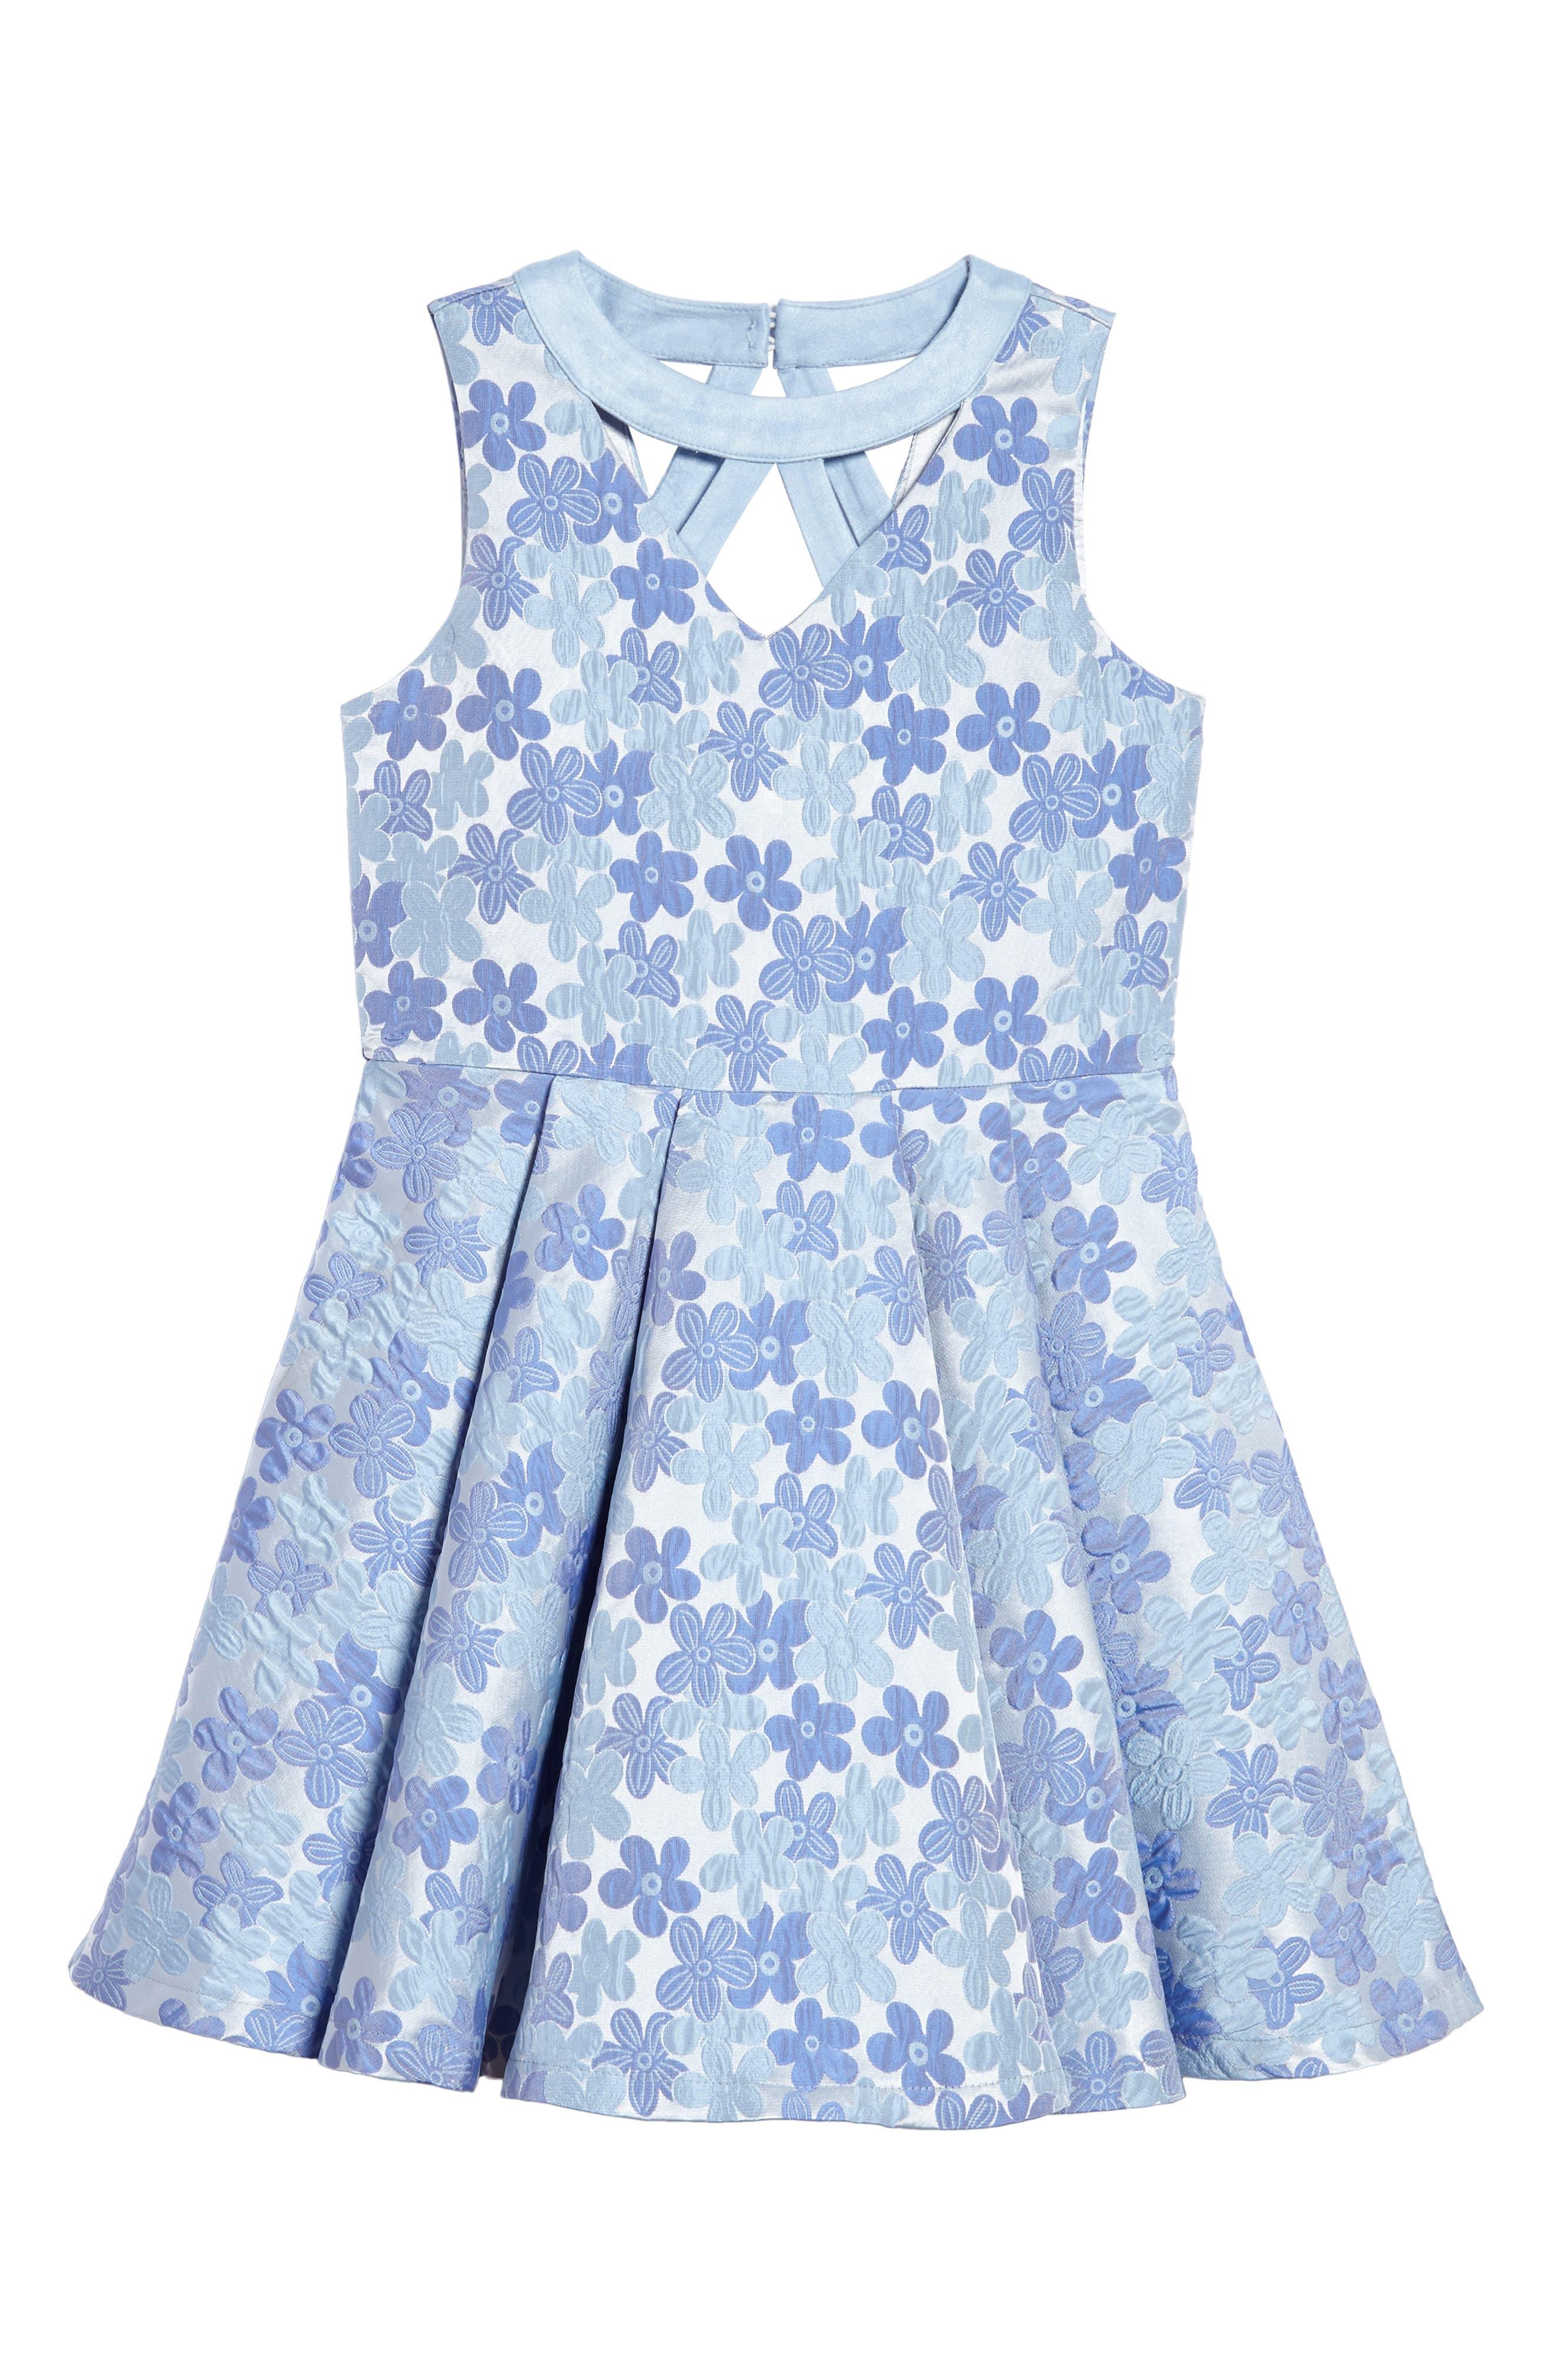 Elisa B Daisy Brocade Fit & Flare Dress (Big Girls)